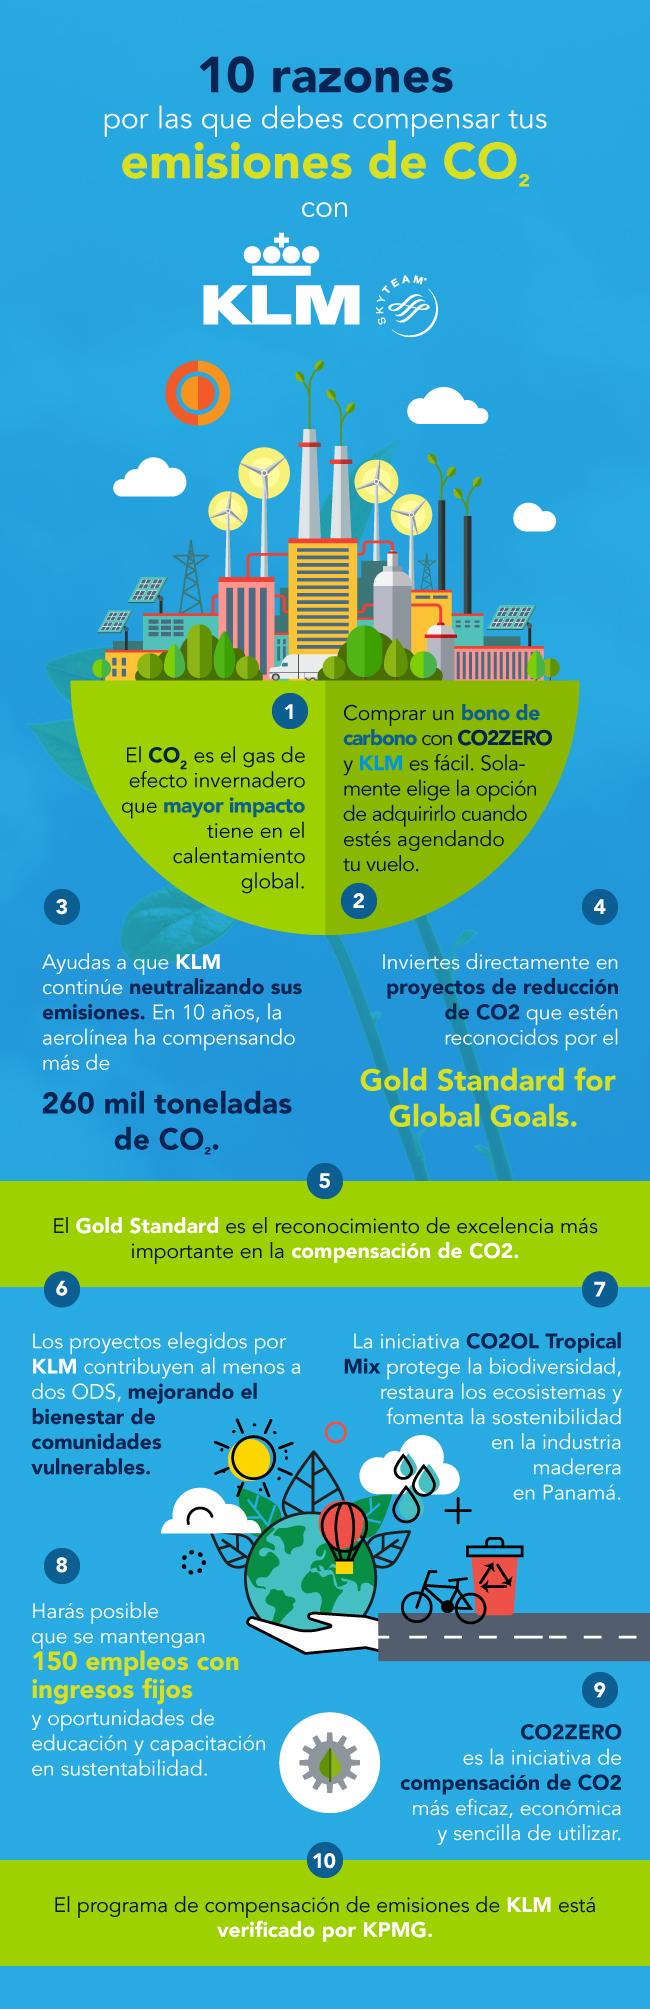 como compensar el co2 de tu vuelo, klm, air france, air france-klm, sustentabilidad klm, rse de klm, responsabilidad social de klm, klm takes care, co2zero, bonos de carbono klm, co2ol tropical mix, gold standard for the global goals, ods, objetivos de desarrollo sostenible